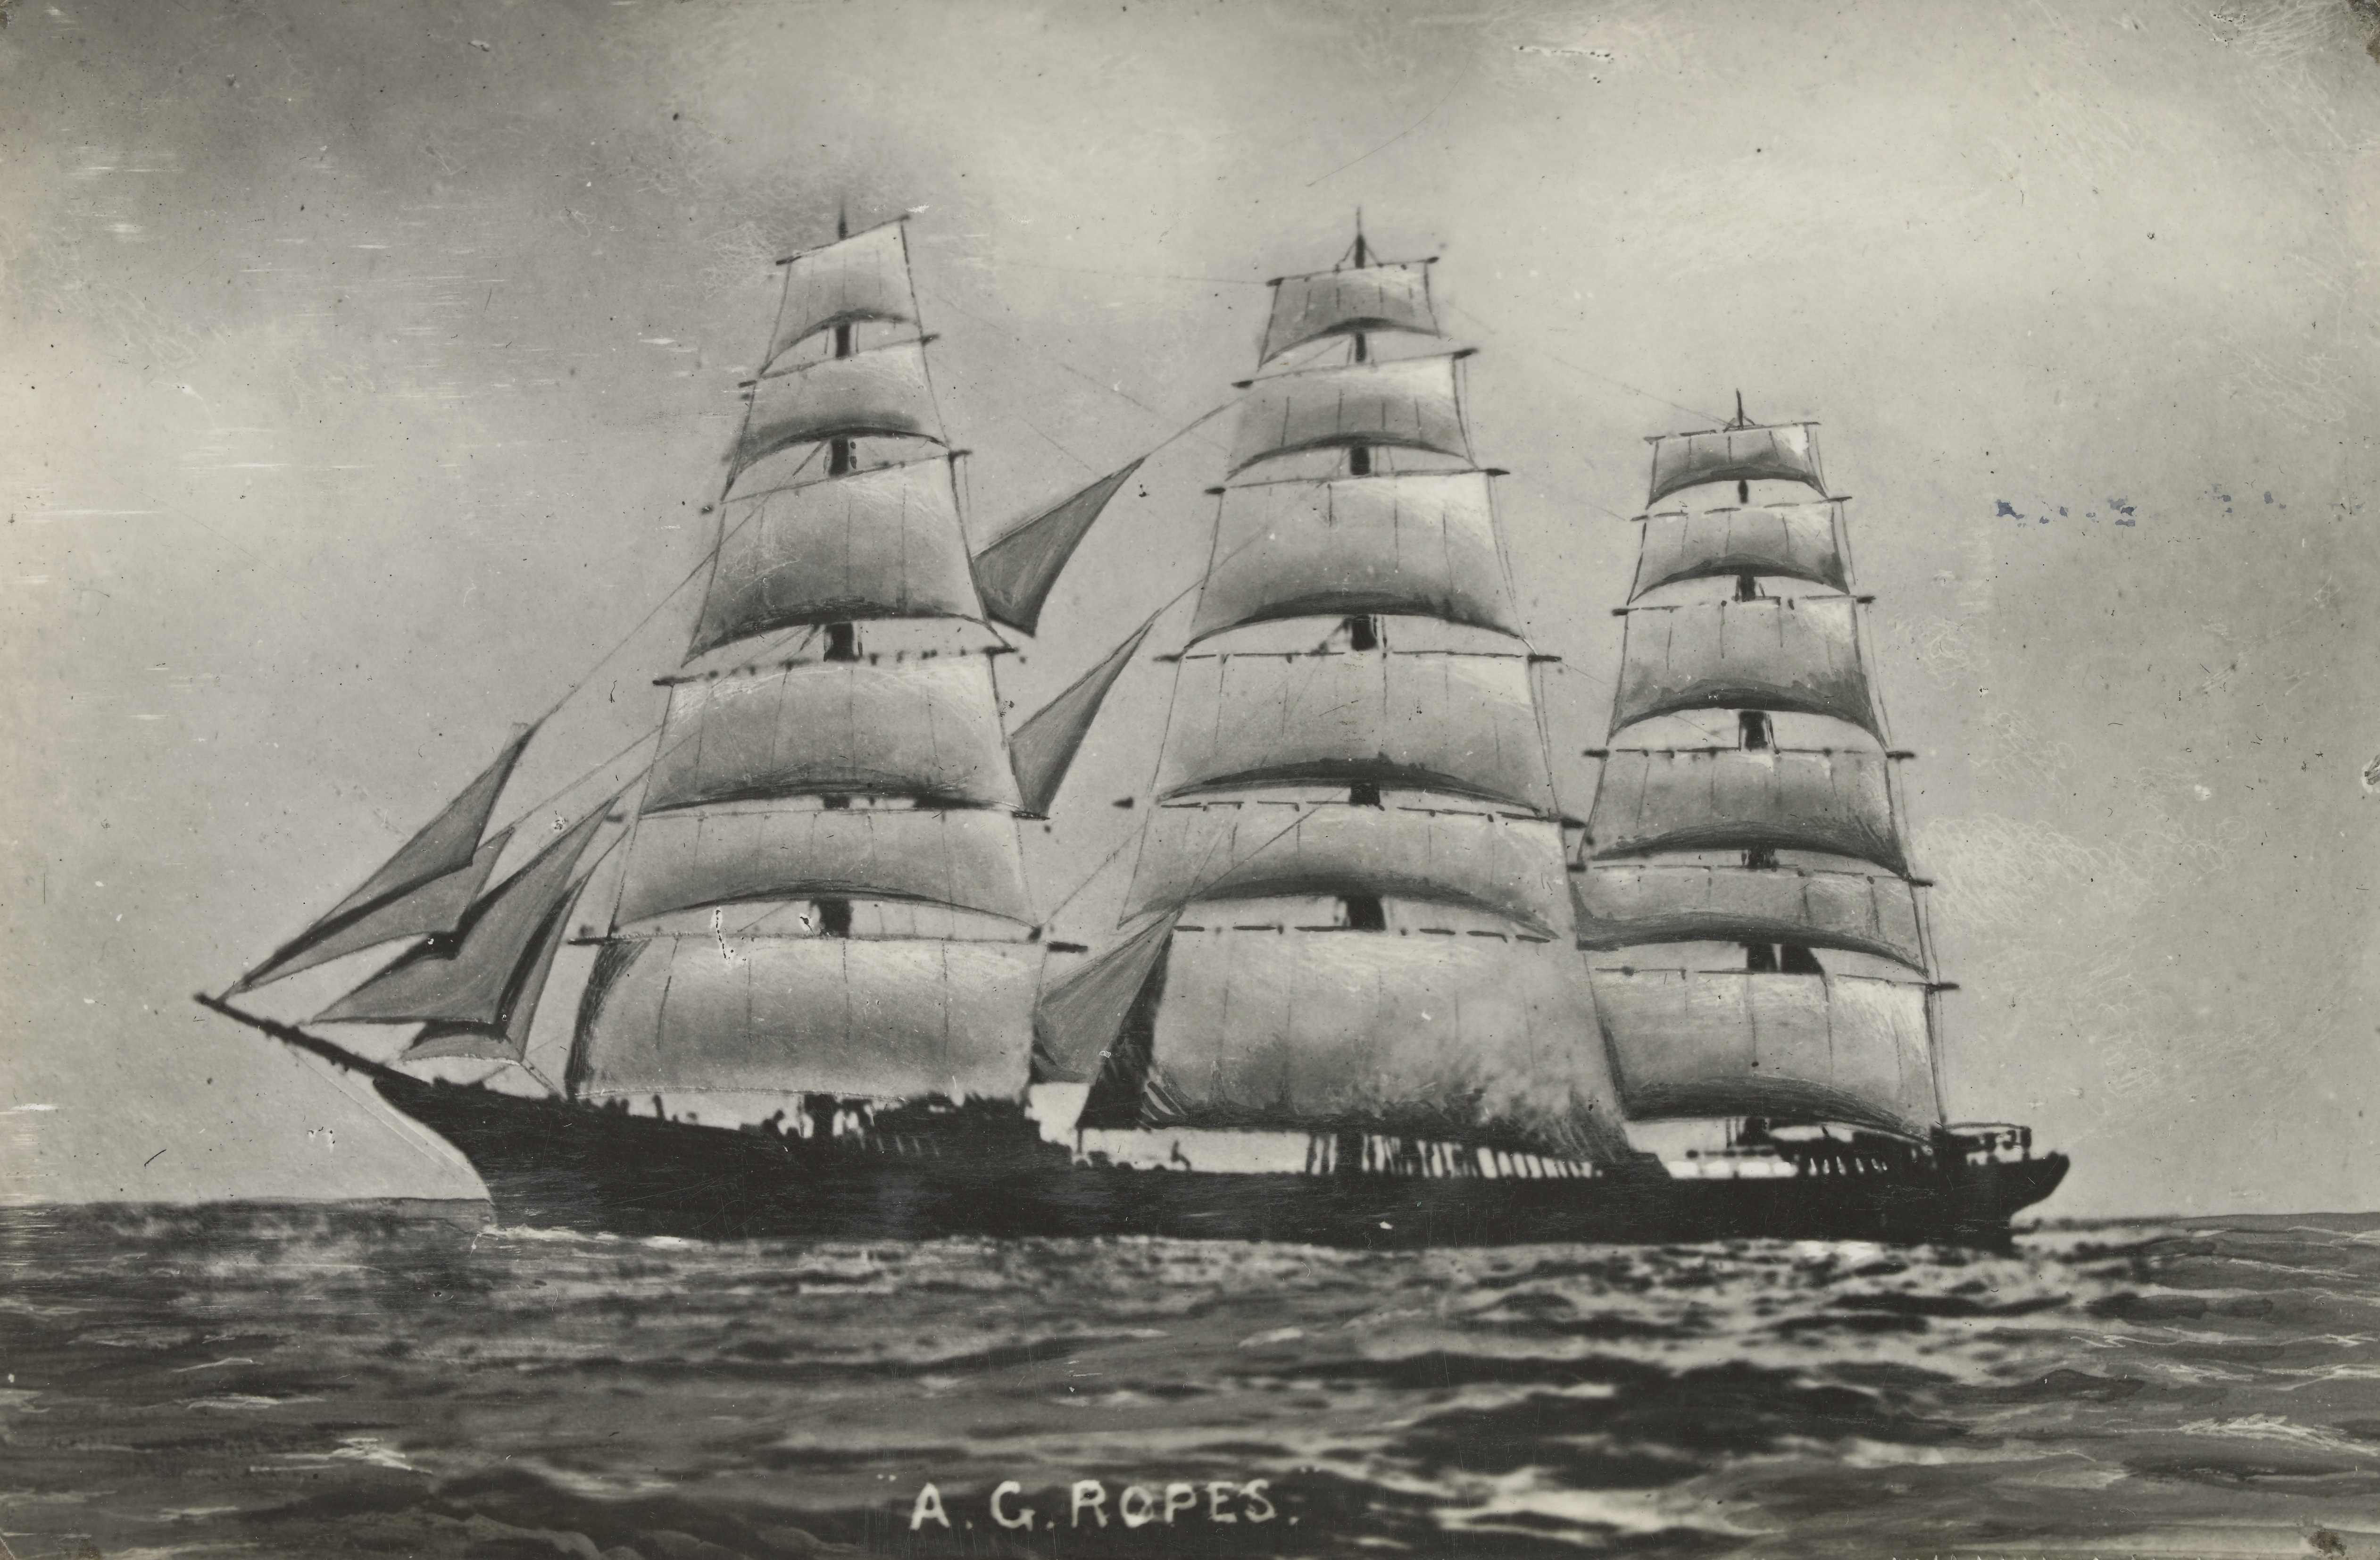 File:A.G. Ropes (ship, 1884) - SLV H99.220-4373